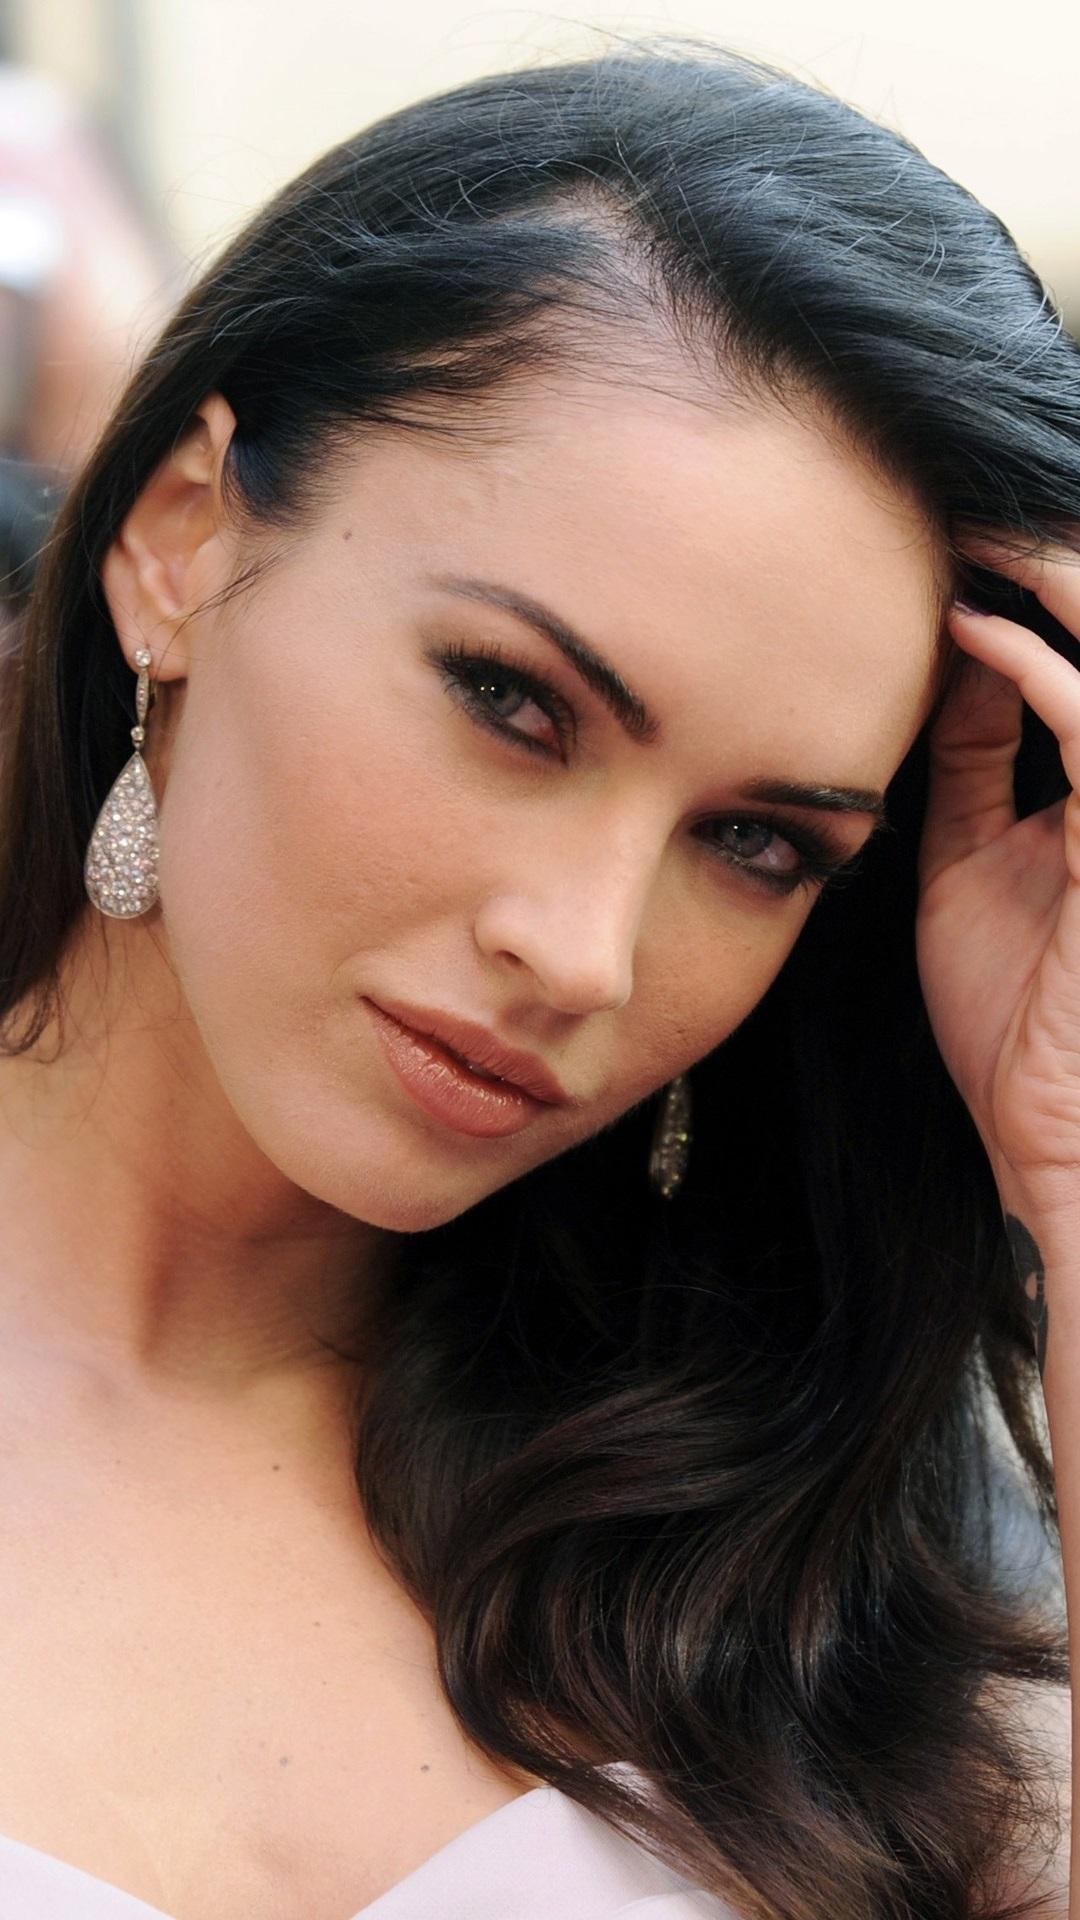 Megan Fox 10 1080x1920 Iphone 8766s Plus Wallpaper